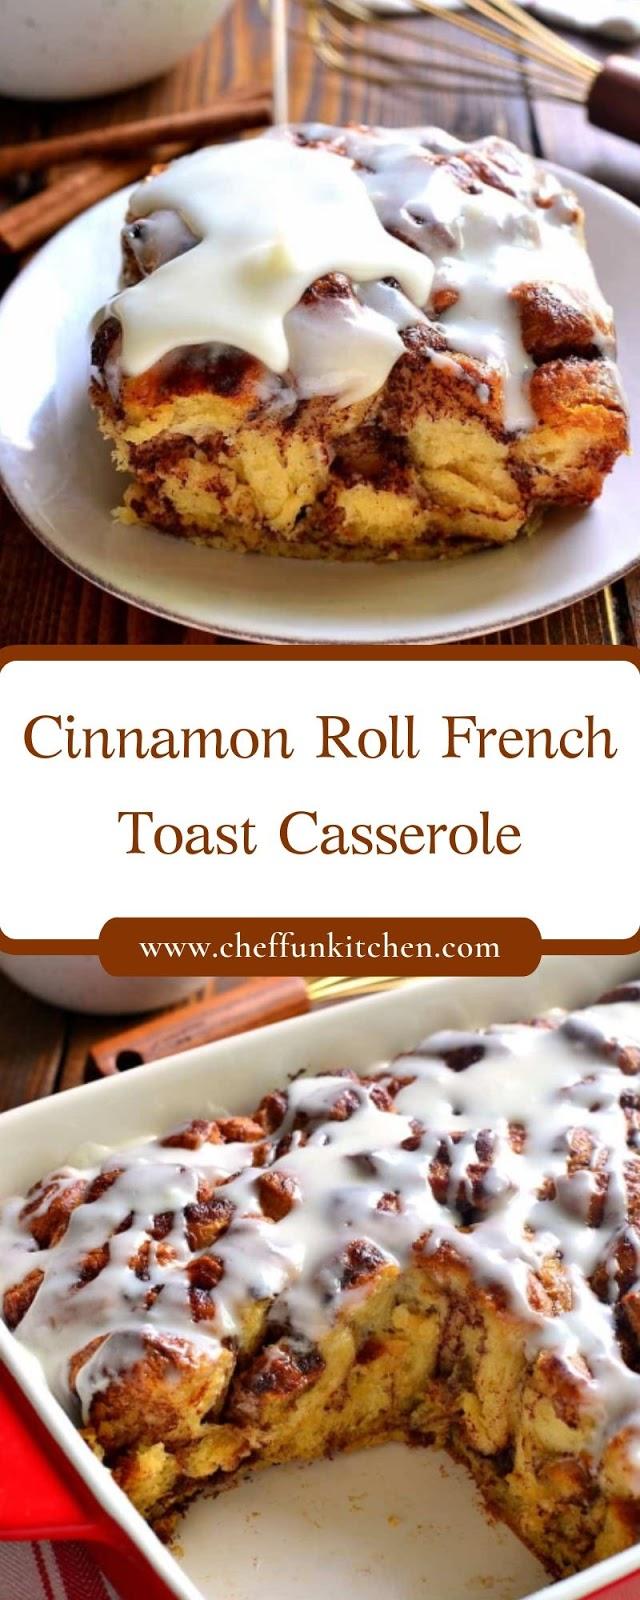 Cinnamon Roll French Toast Casserole